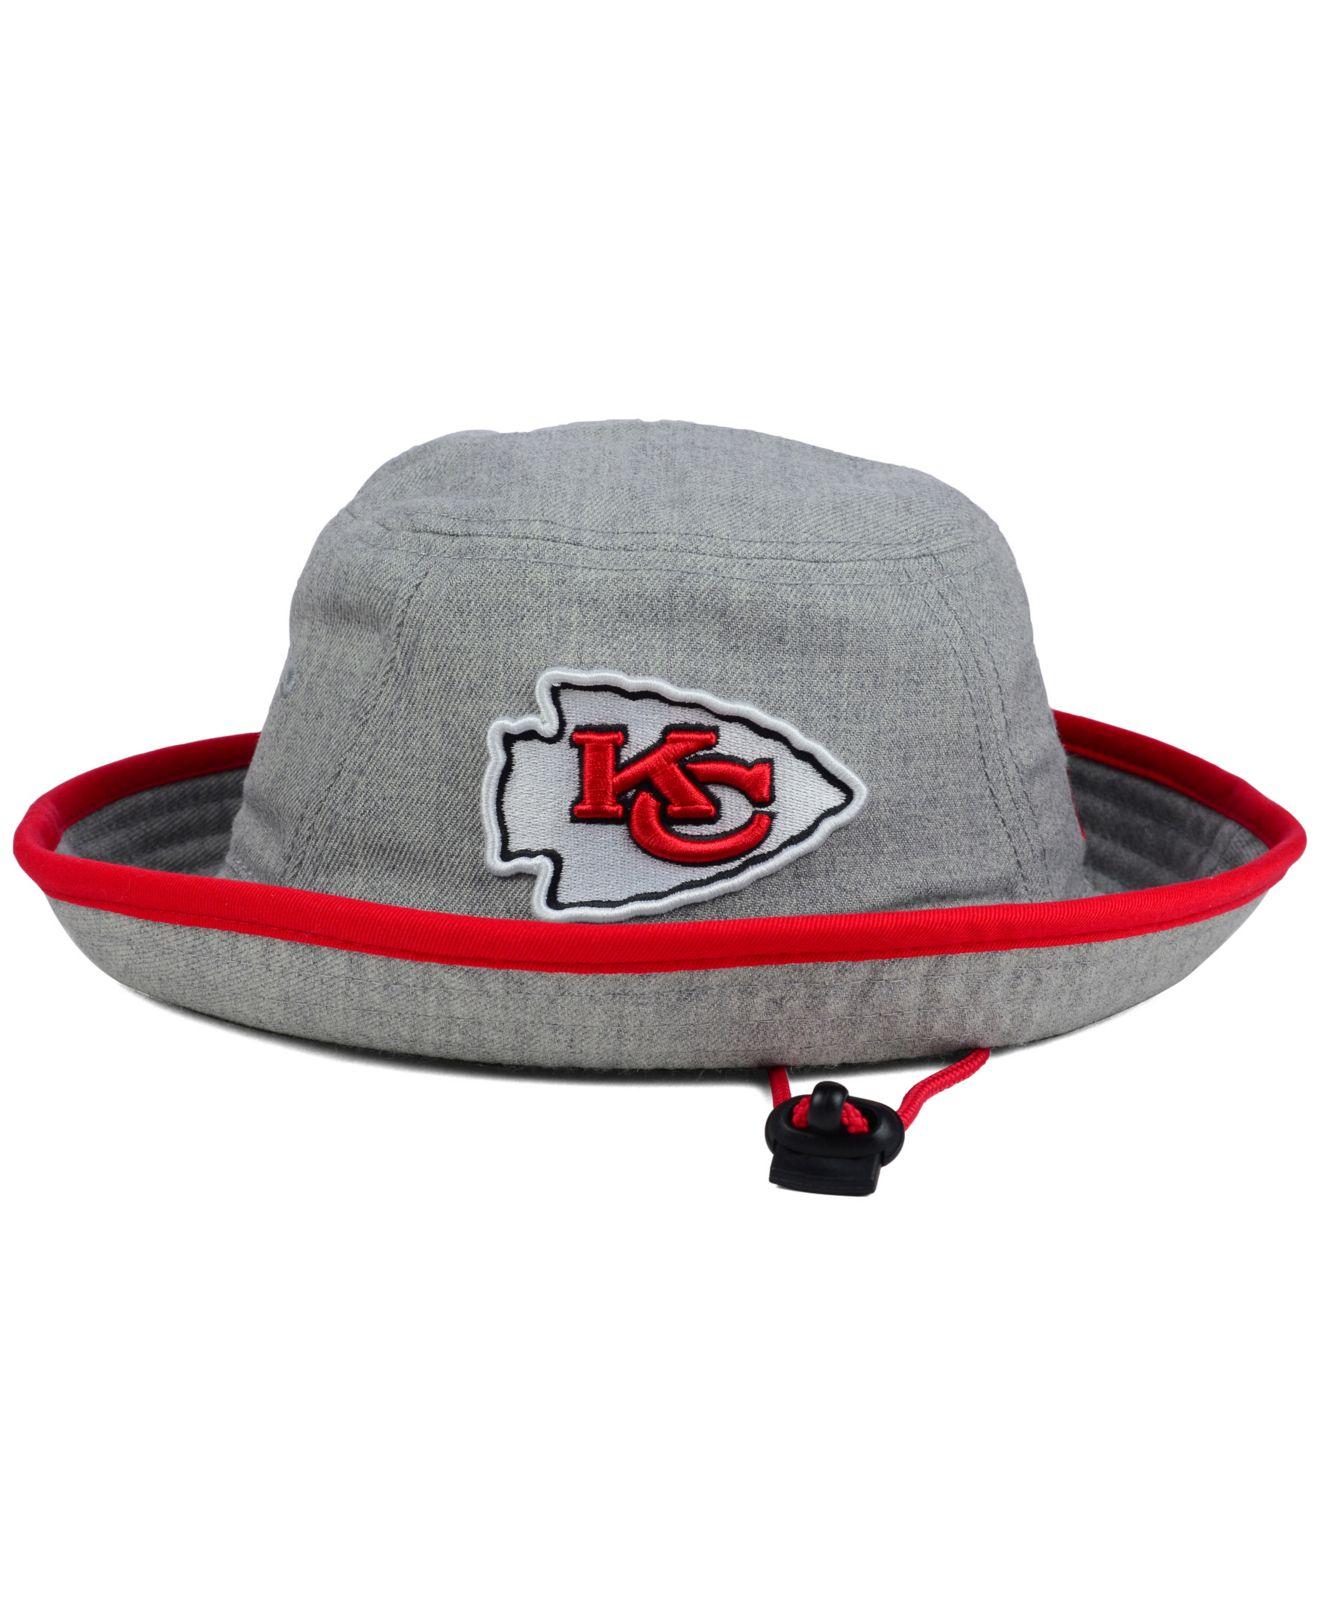 903e28982f1 ... usa lyst ktz kansas city chiefs nfl heather gray bucket hat in gray  d9741 61b32